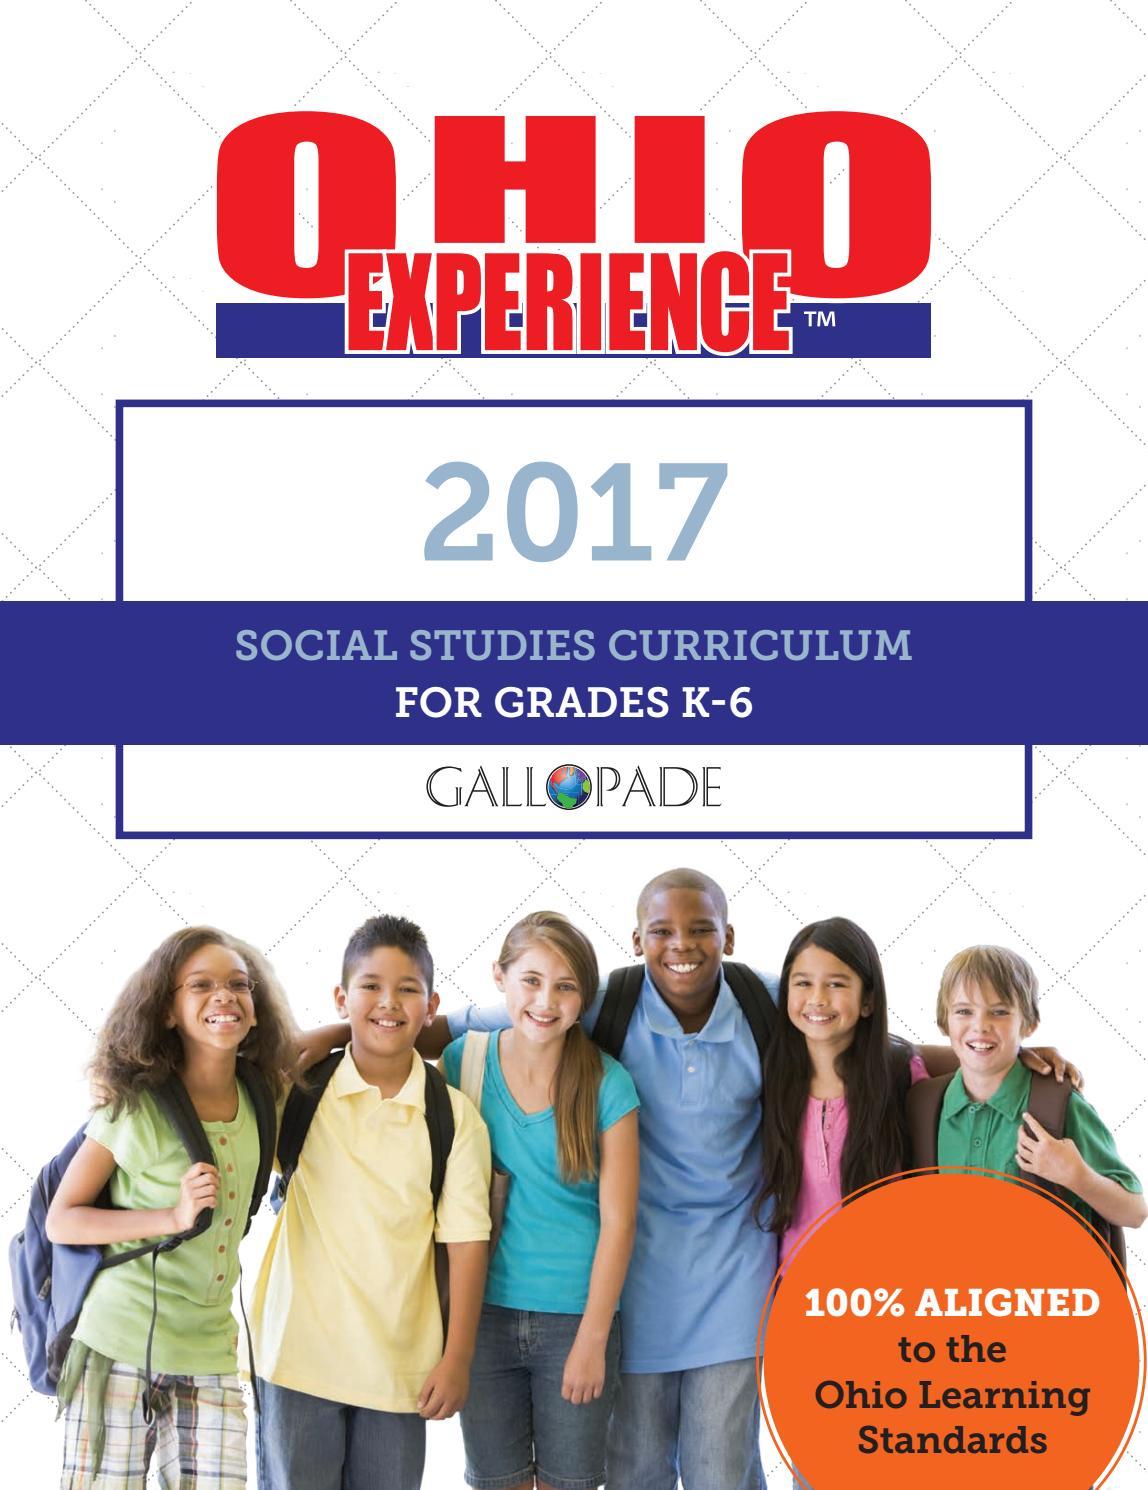 Ohio Experience 2017 Social Studies Curriculum Catalog by